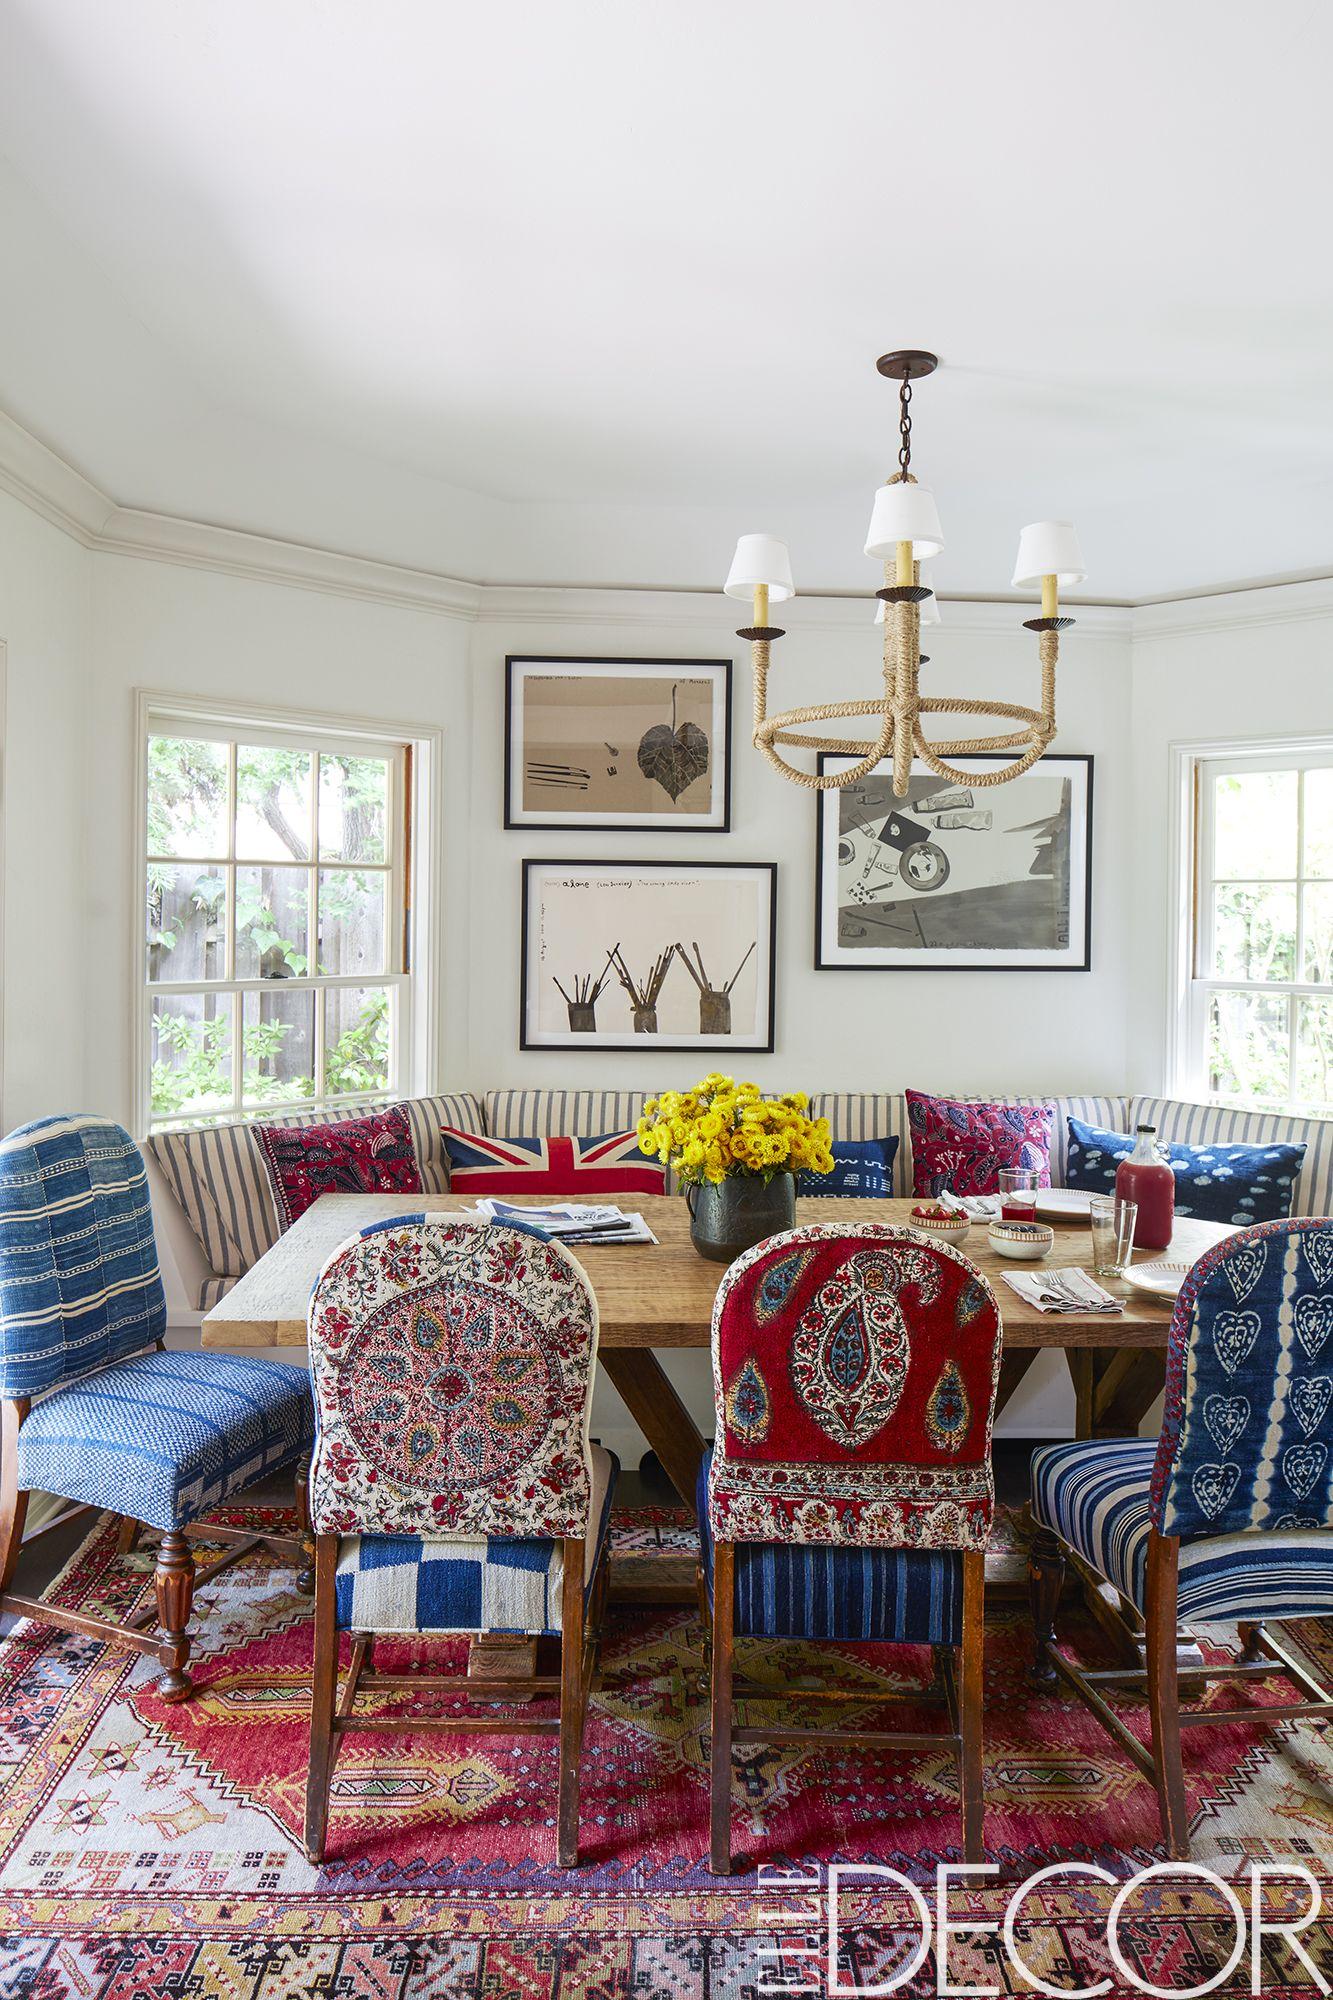 Bohemian Room Decor Ideas Bohemian Style Interior Design